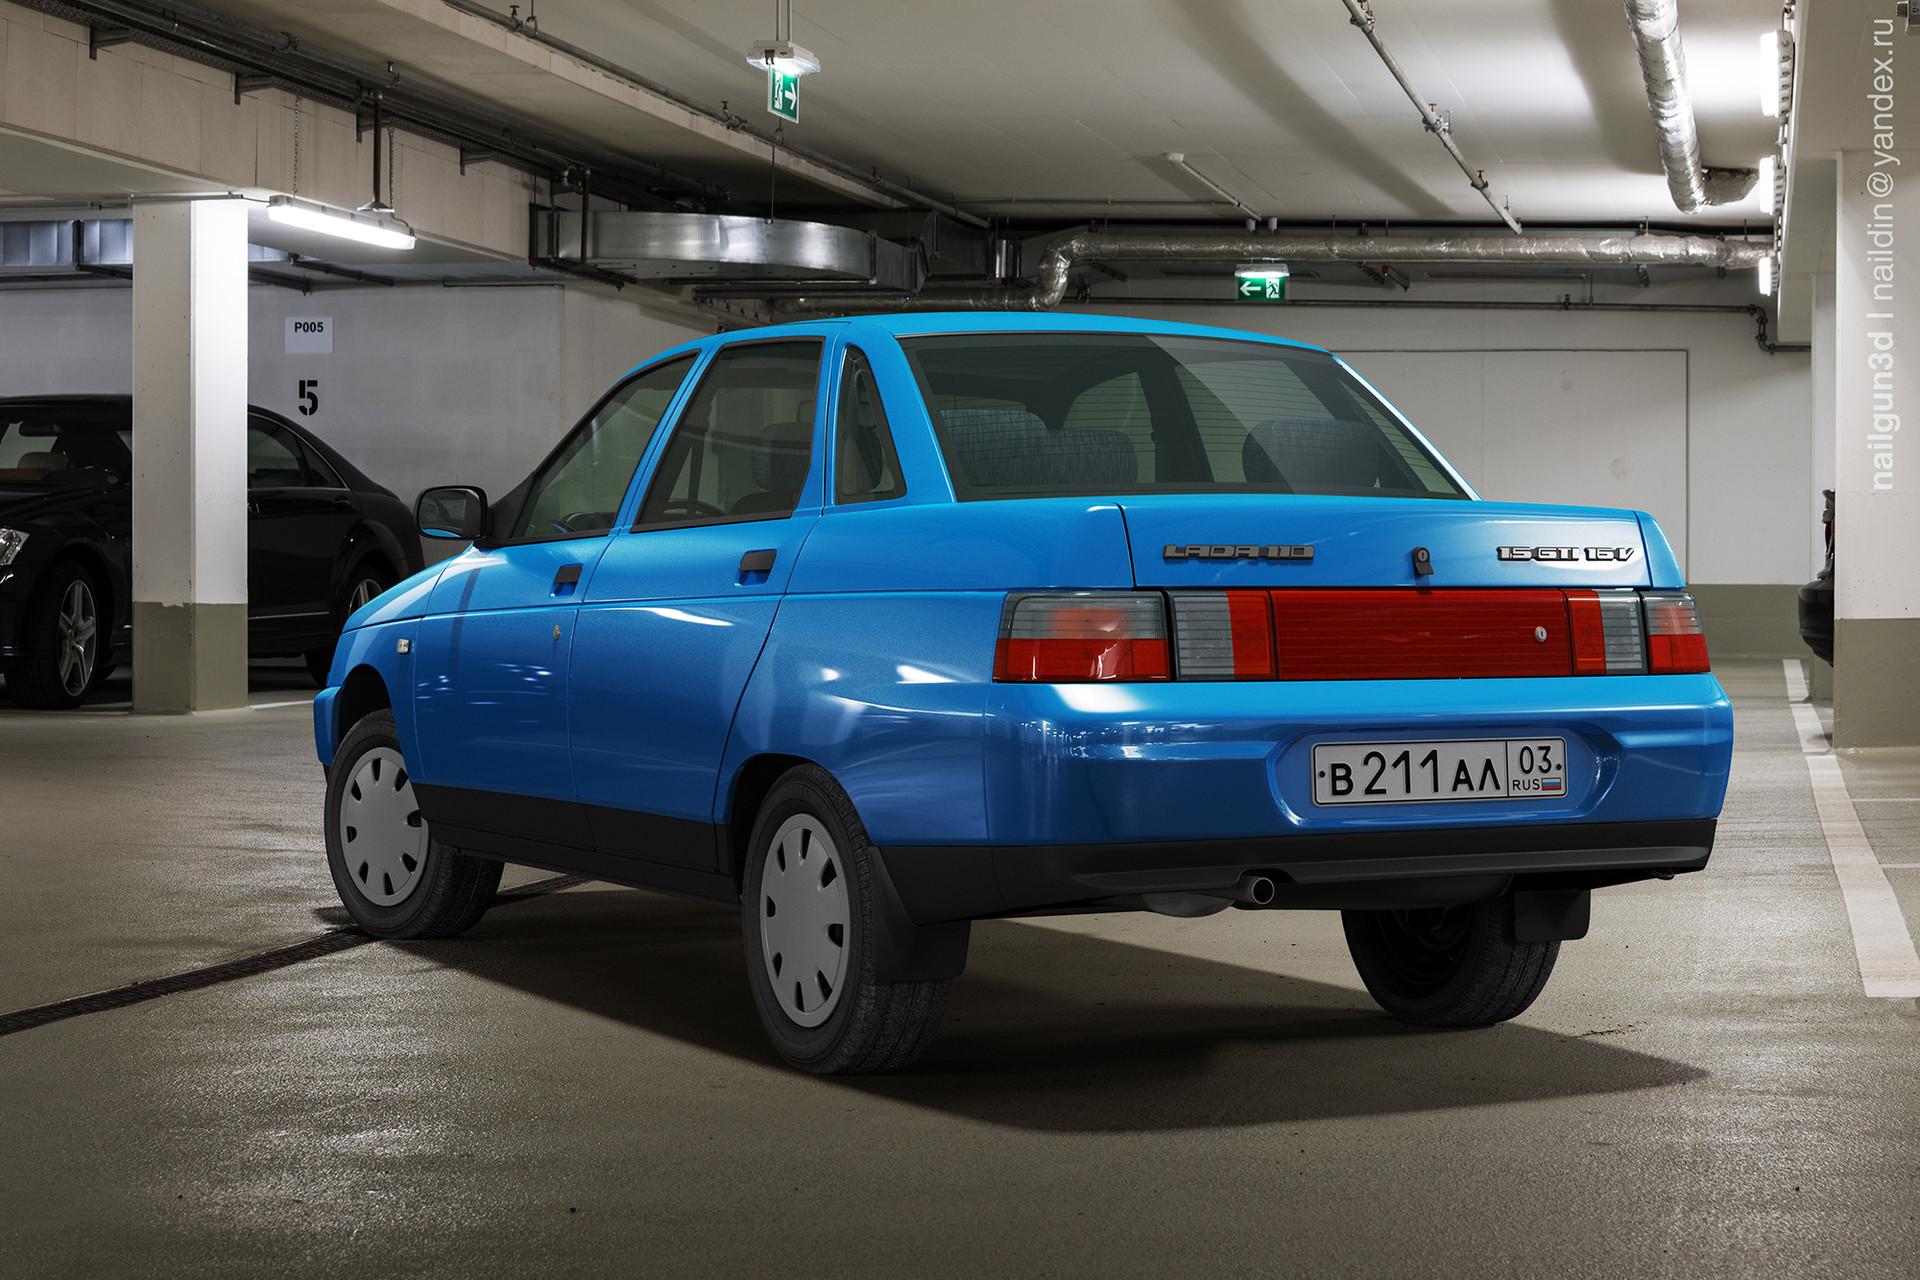 Nail khusnutdinov als 226 010 vaz 2110 rear view 3x